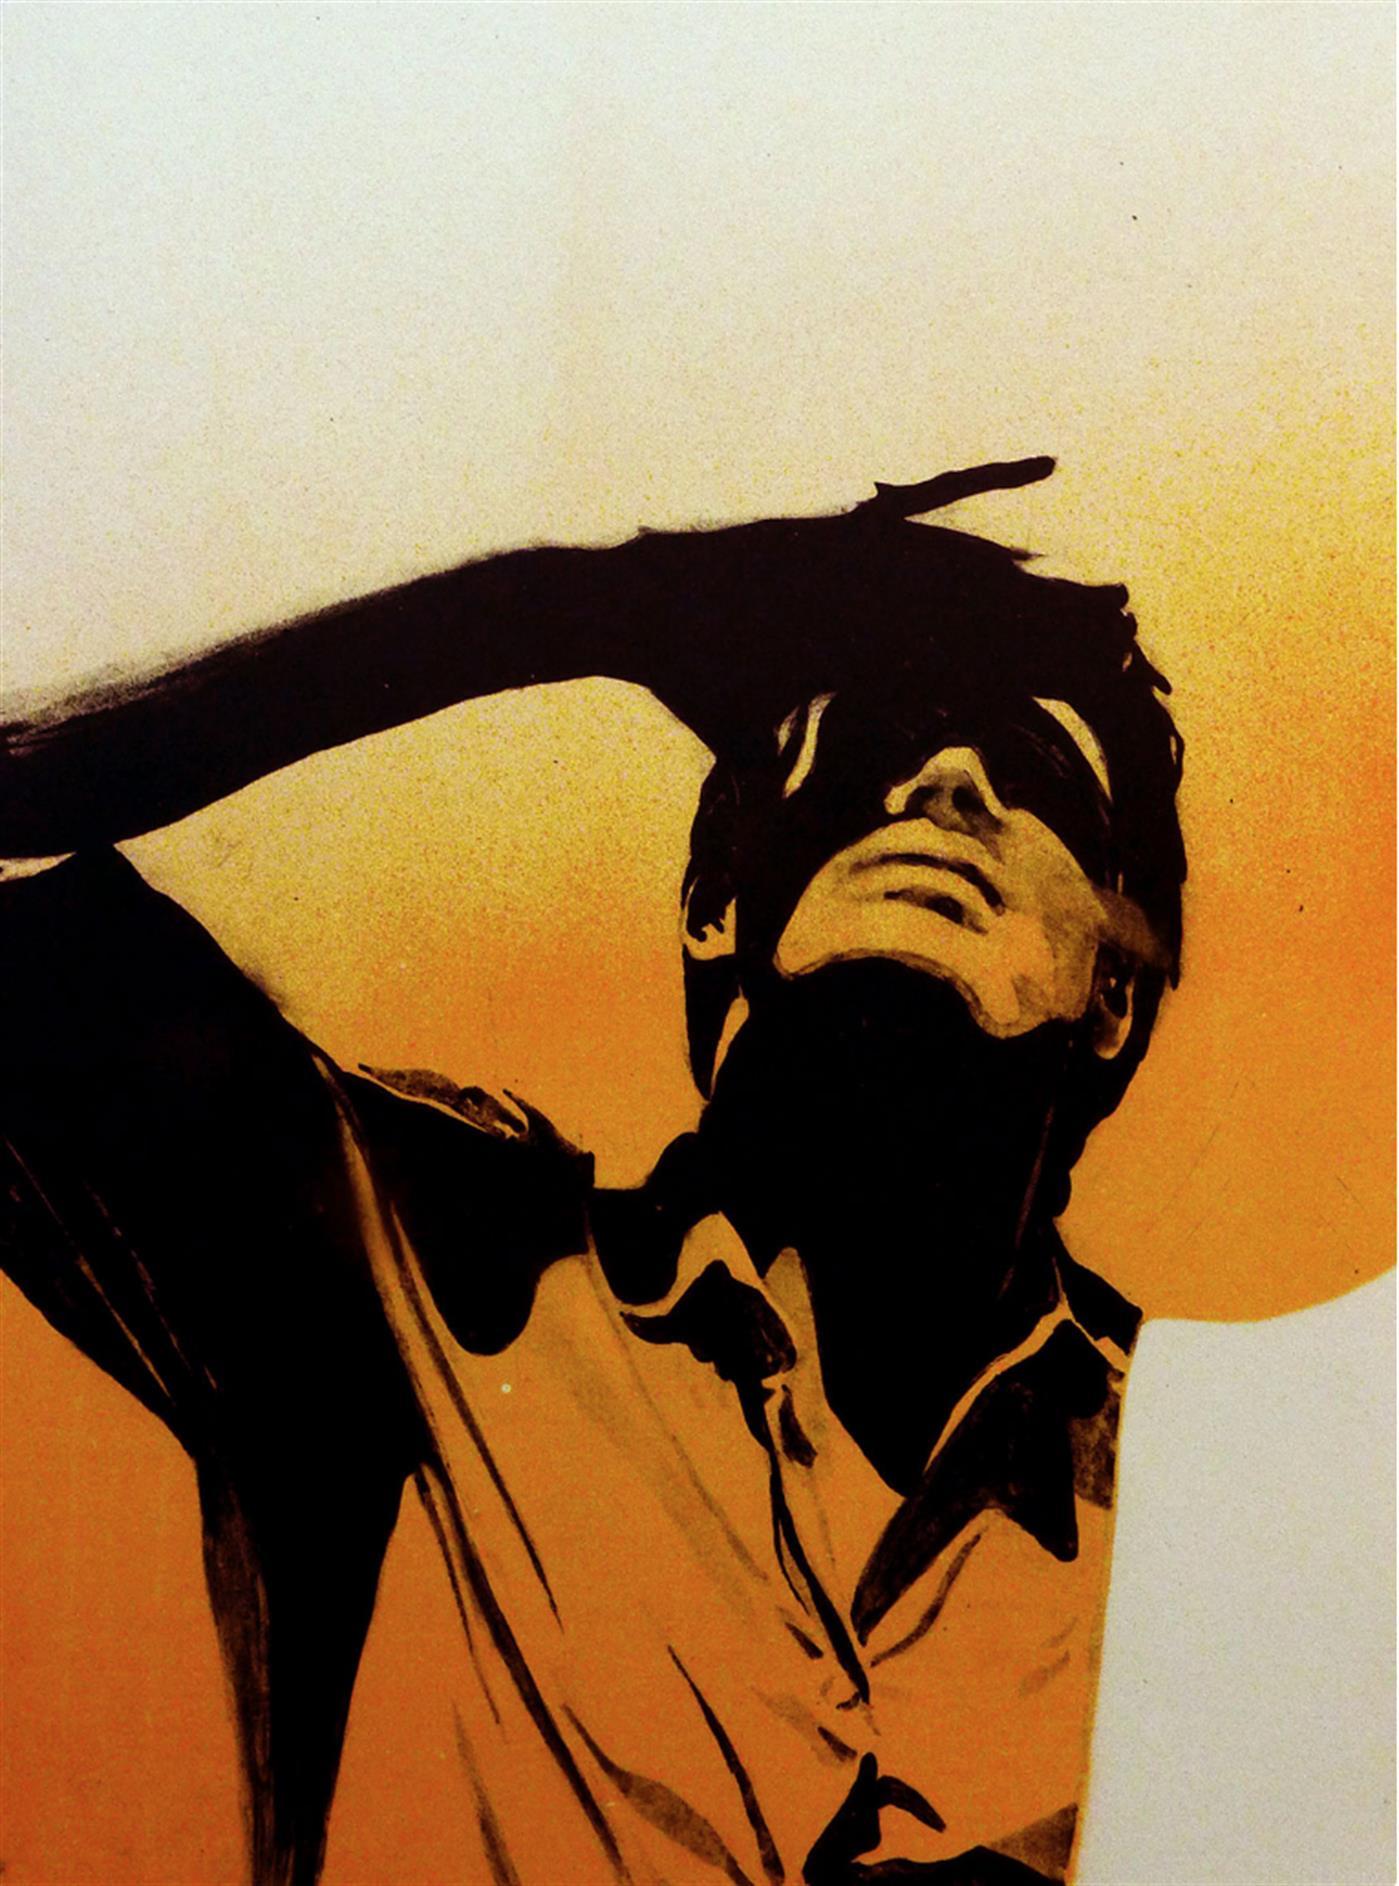 Joakim Allgulander - Blinded, colour lithograph